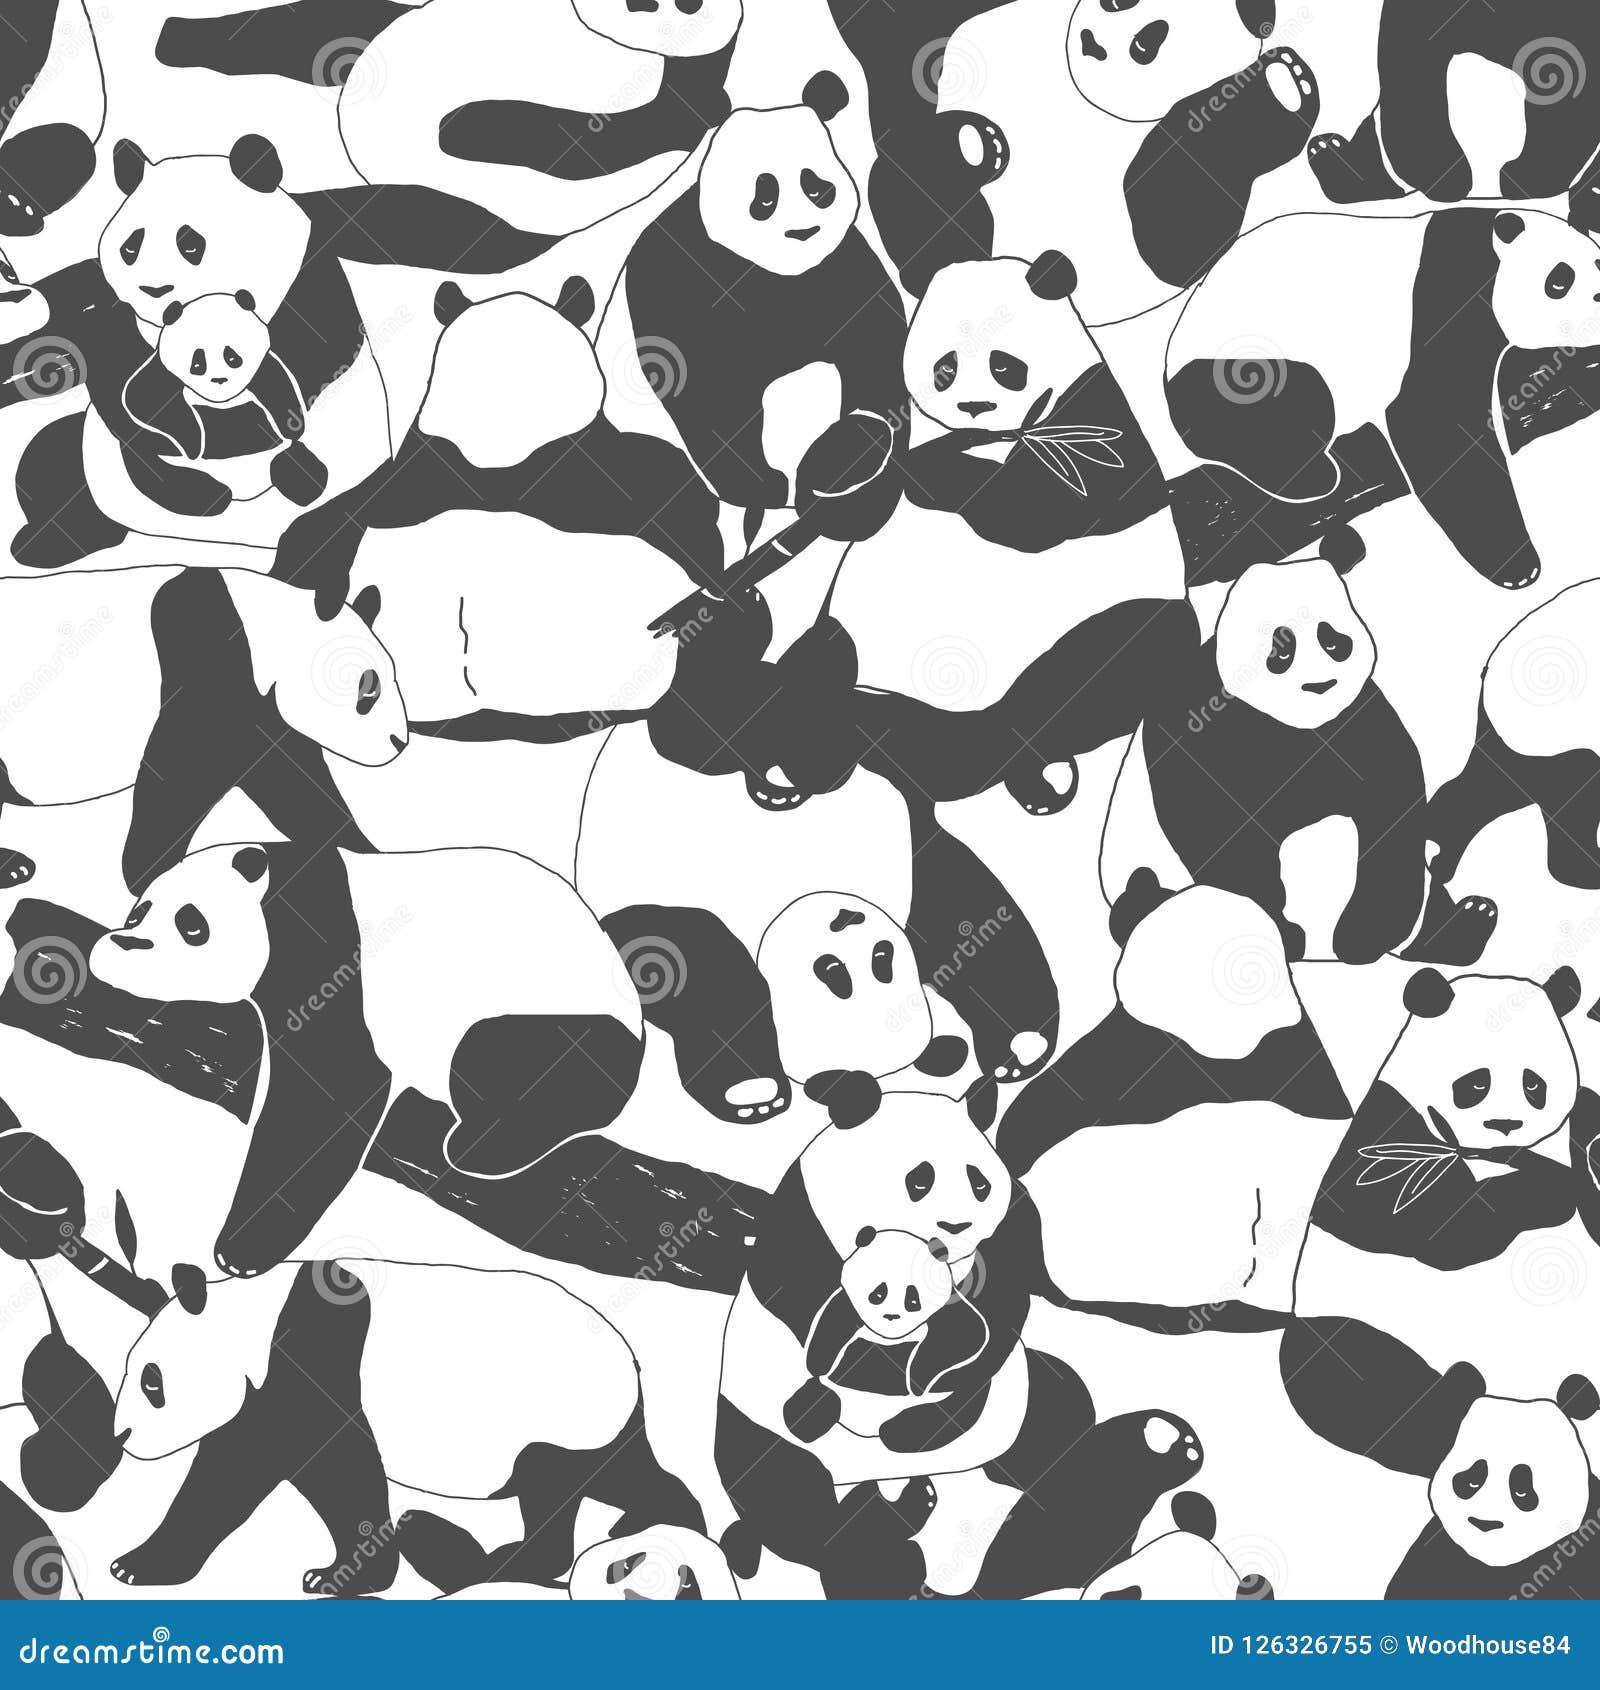 Cute Panda Bear Seamless Pattern Illustration For Textile Print